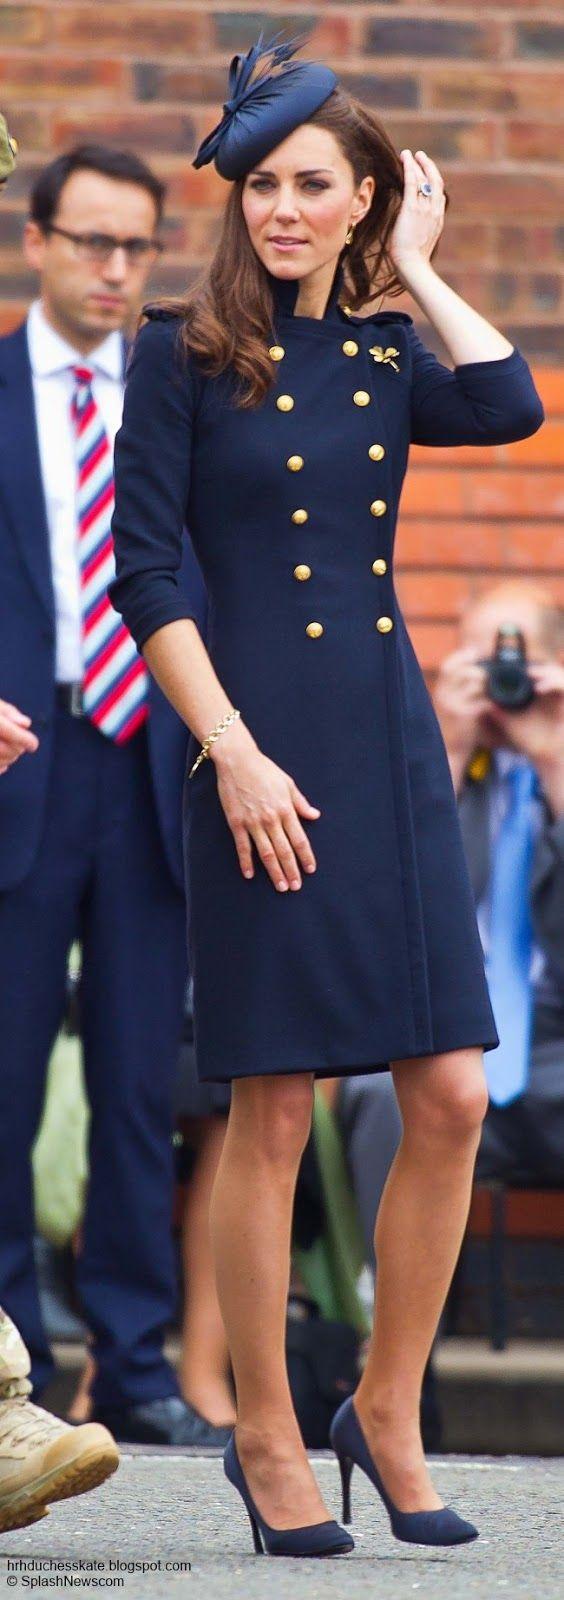 Catherine Duchess of Cambridge, aka Kate Middleton, in a bespoke Alexander McQueen coat dress, hat by Rachel Trevor-Morgan, and Prada shoes. 06/25/11